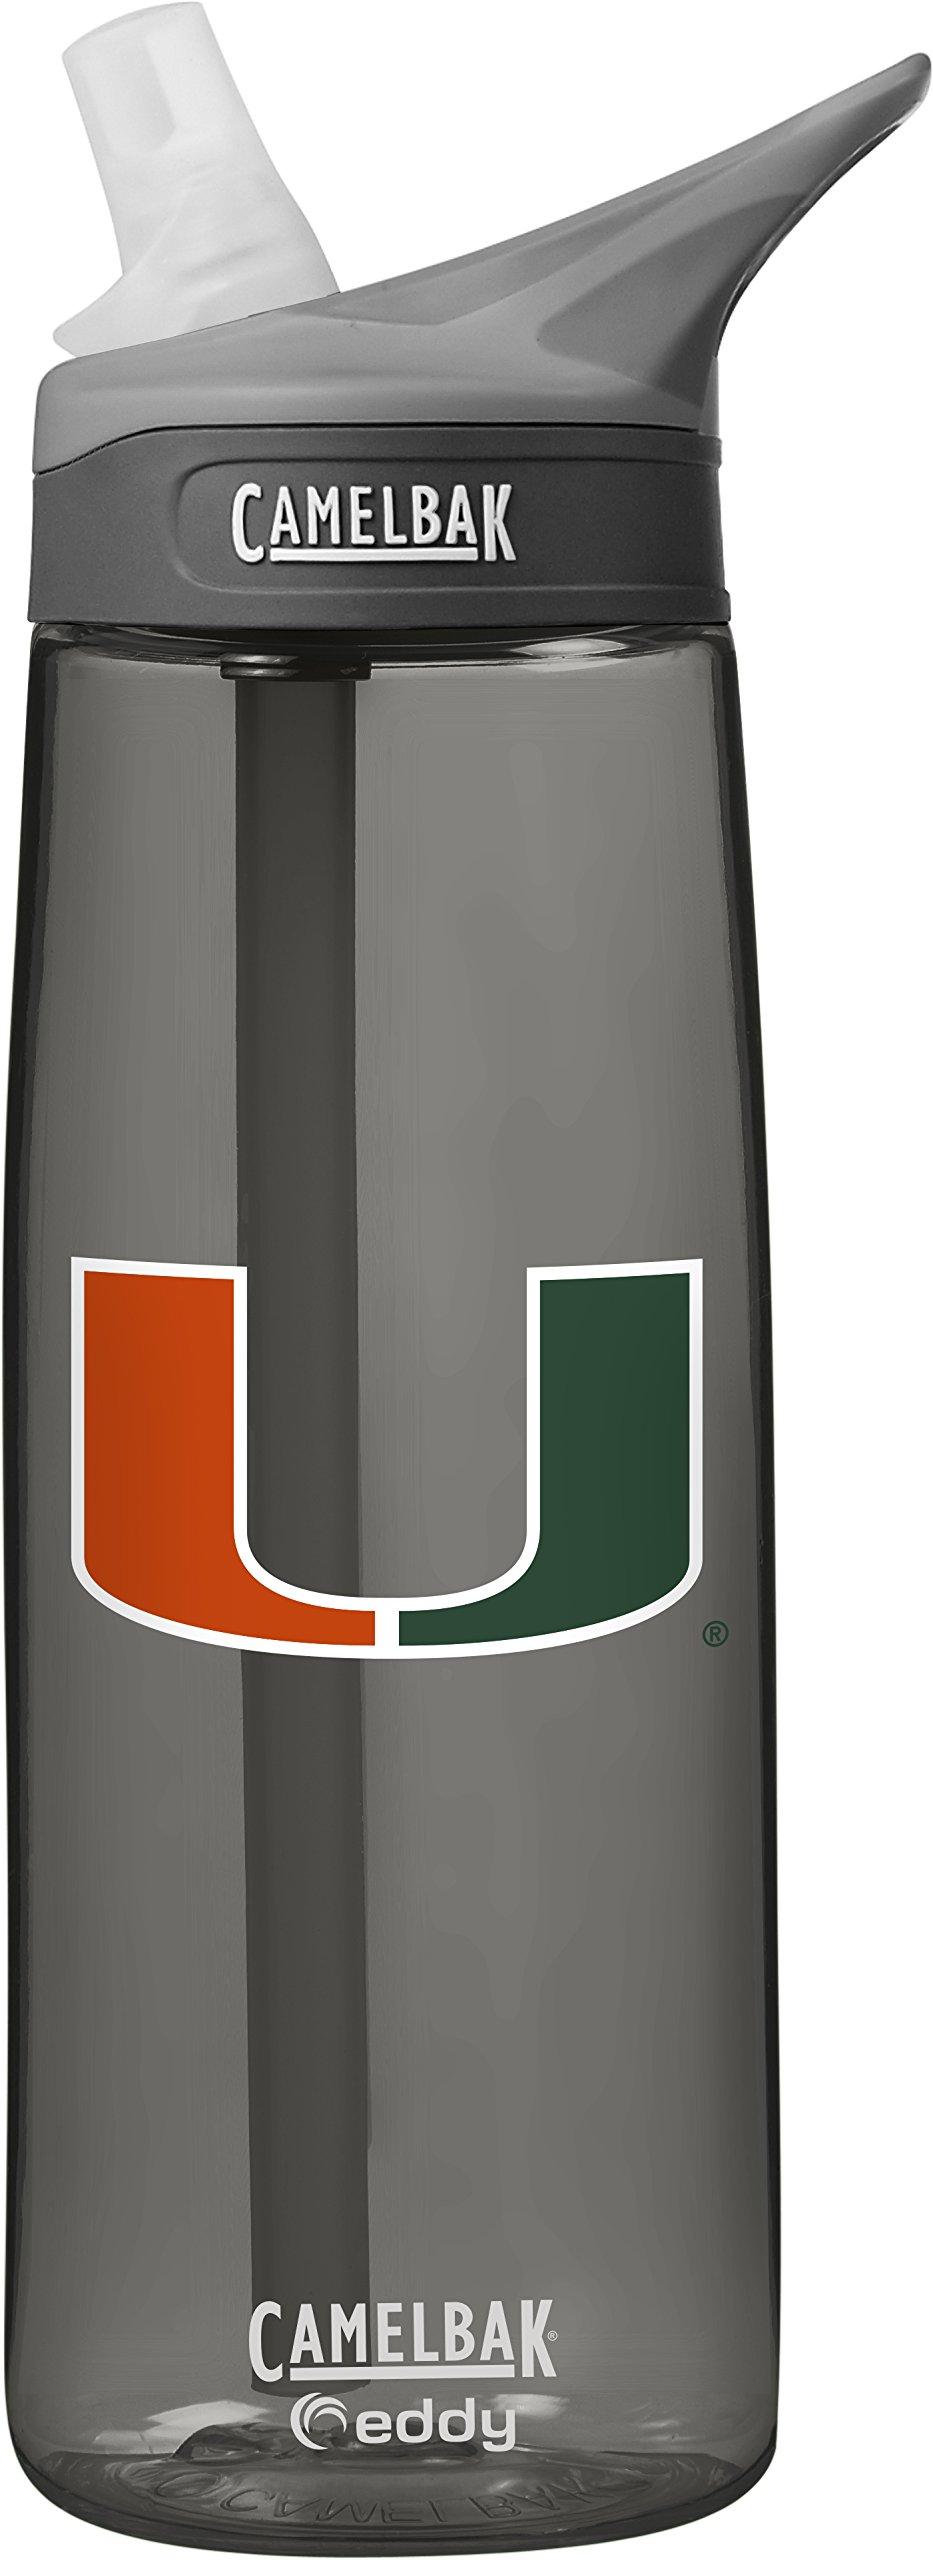 CamelBak NCAA Miami Hurricanes Unisex Eddy 75L Collegiate Water Bottle, Charcoal, 75 Liter